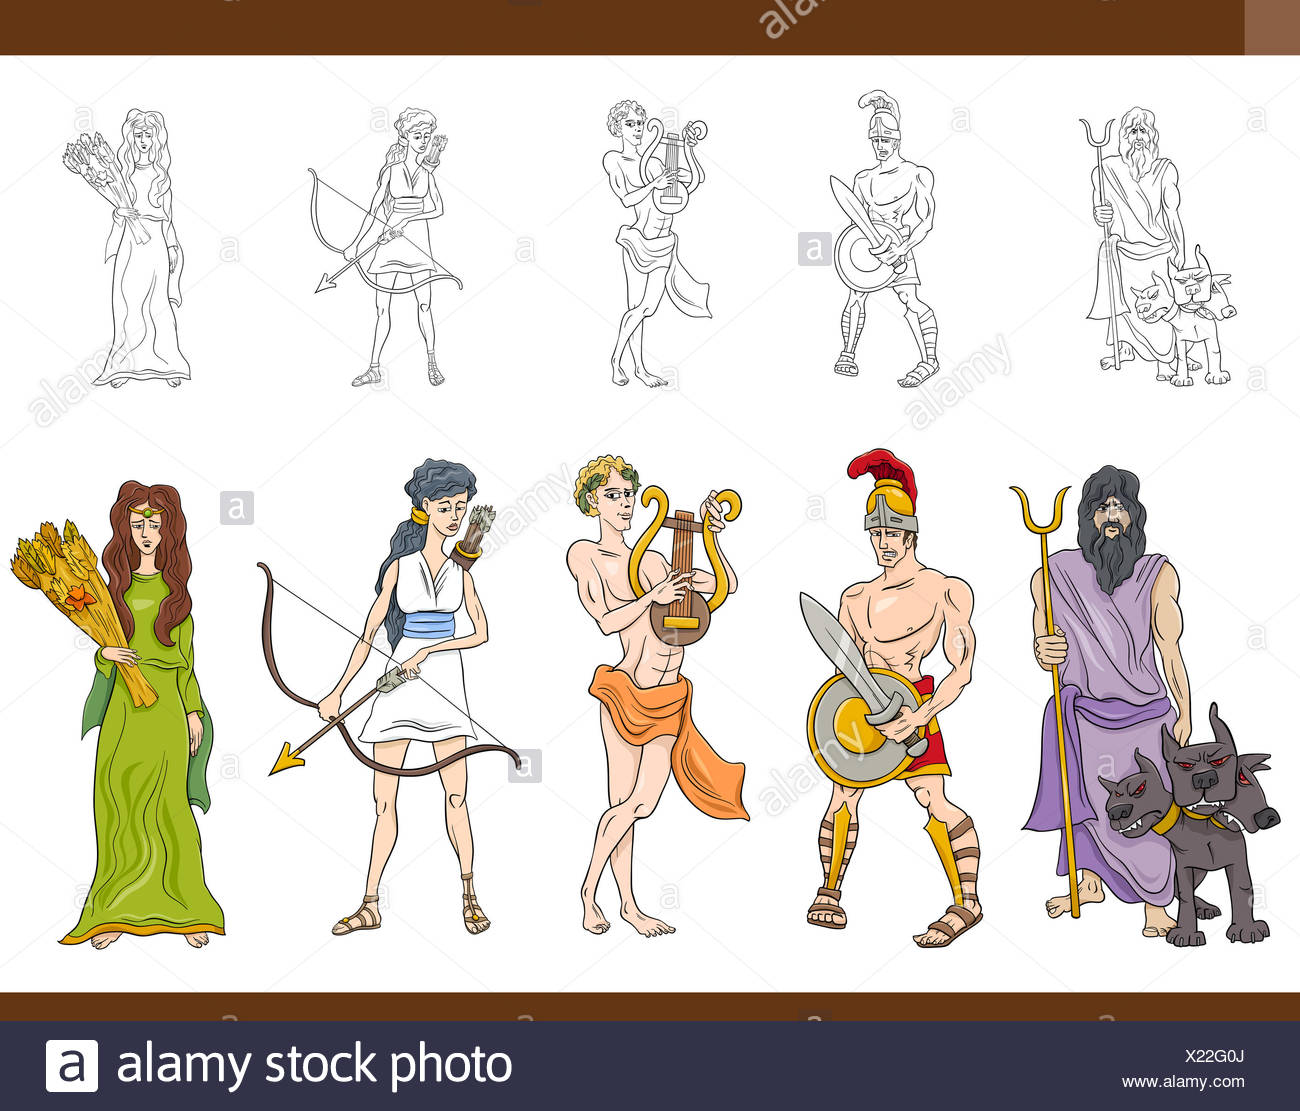 greek gods set illustration - Stock Image